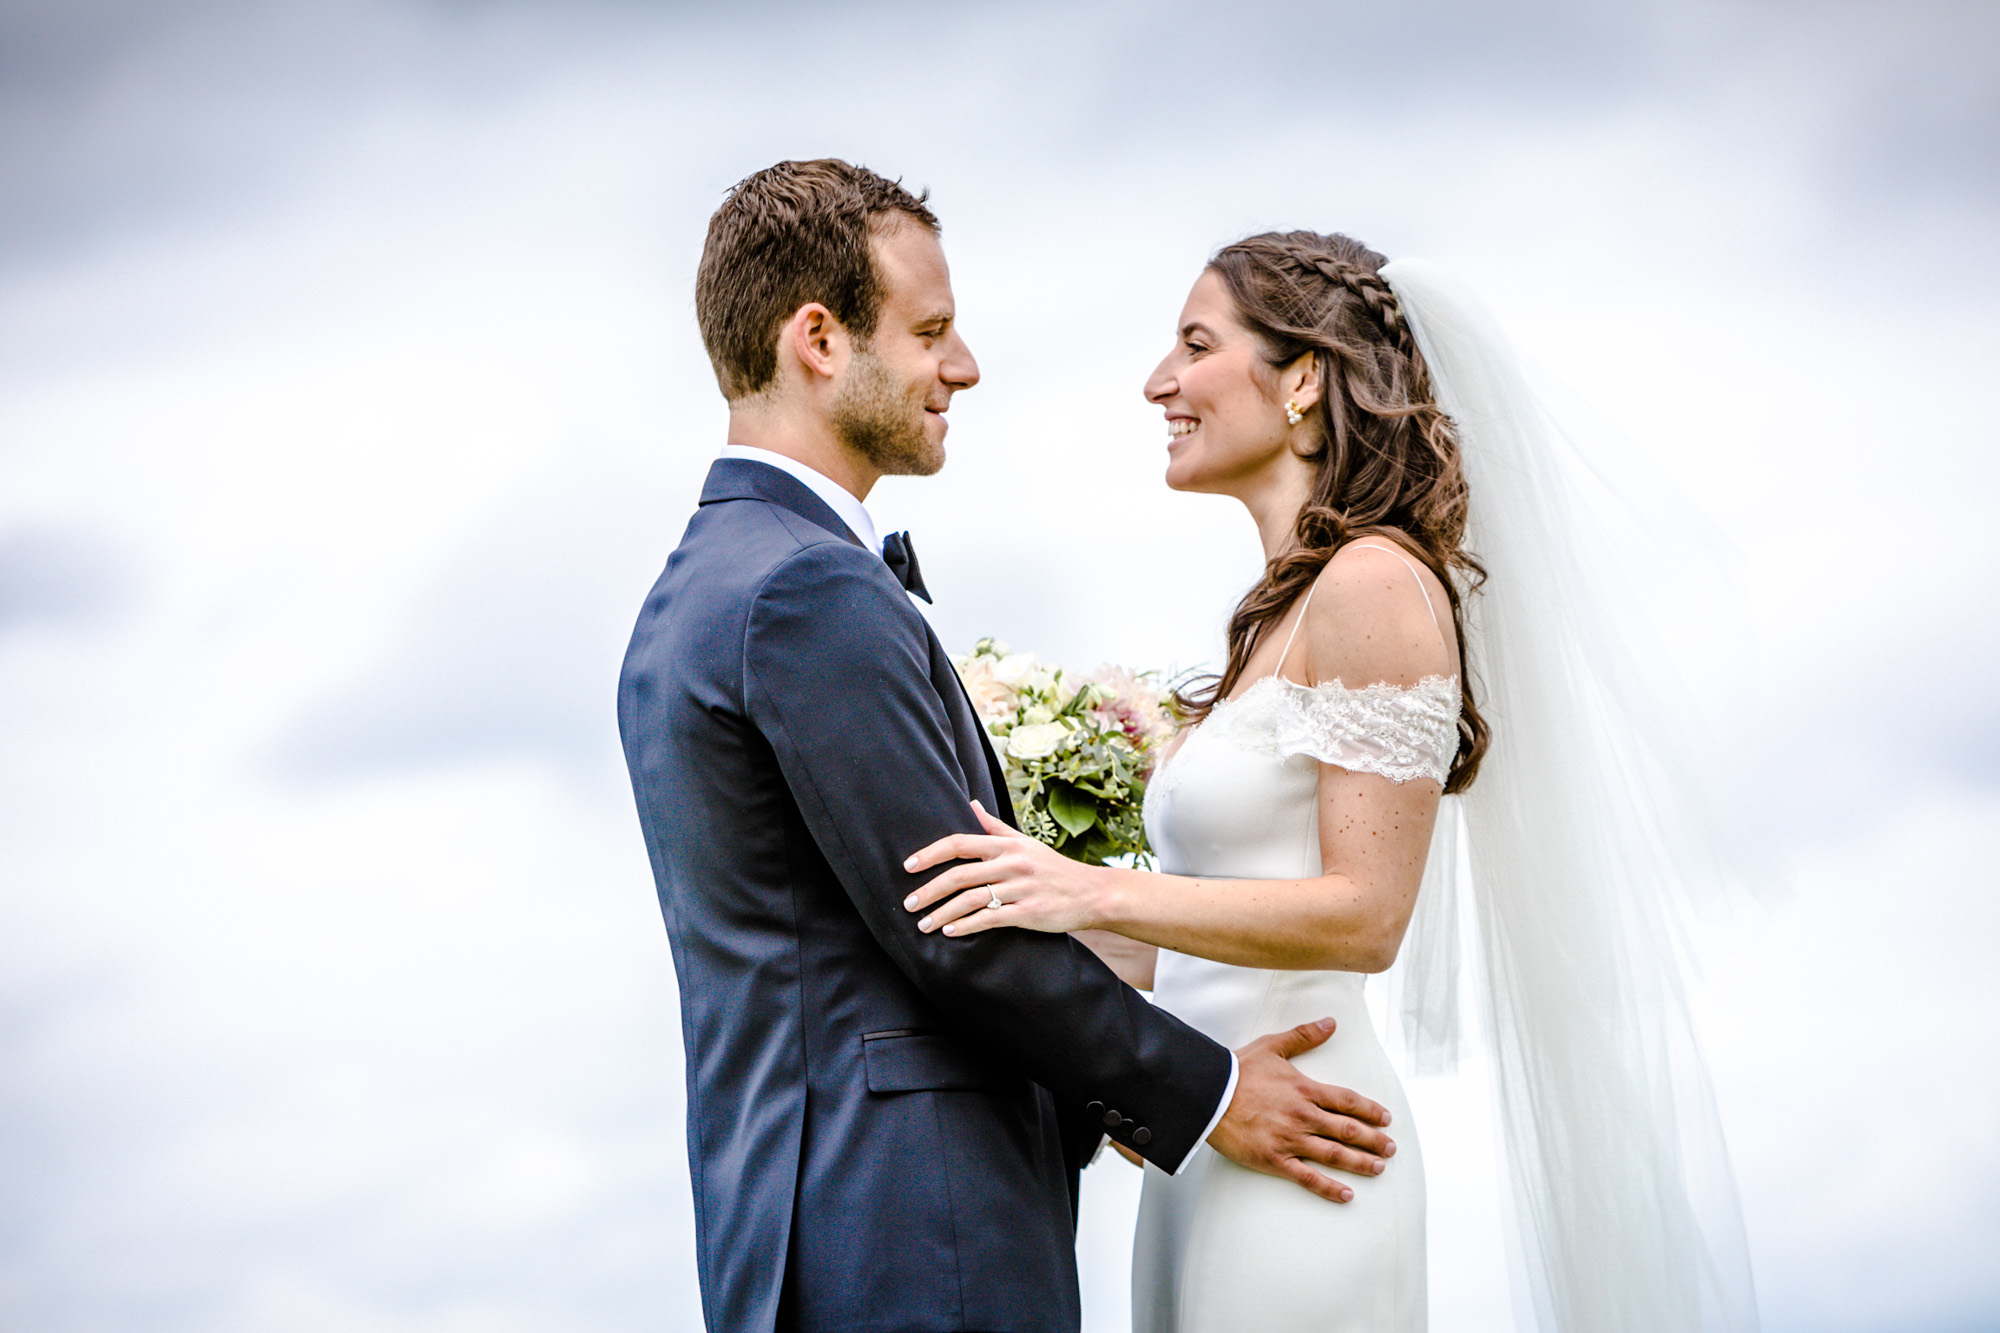 scranton_wedding_photographer_lettieri_pa (15 of 34).jpg